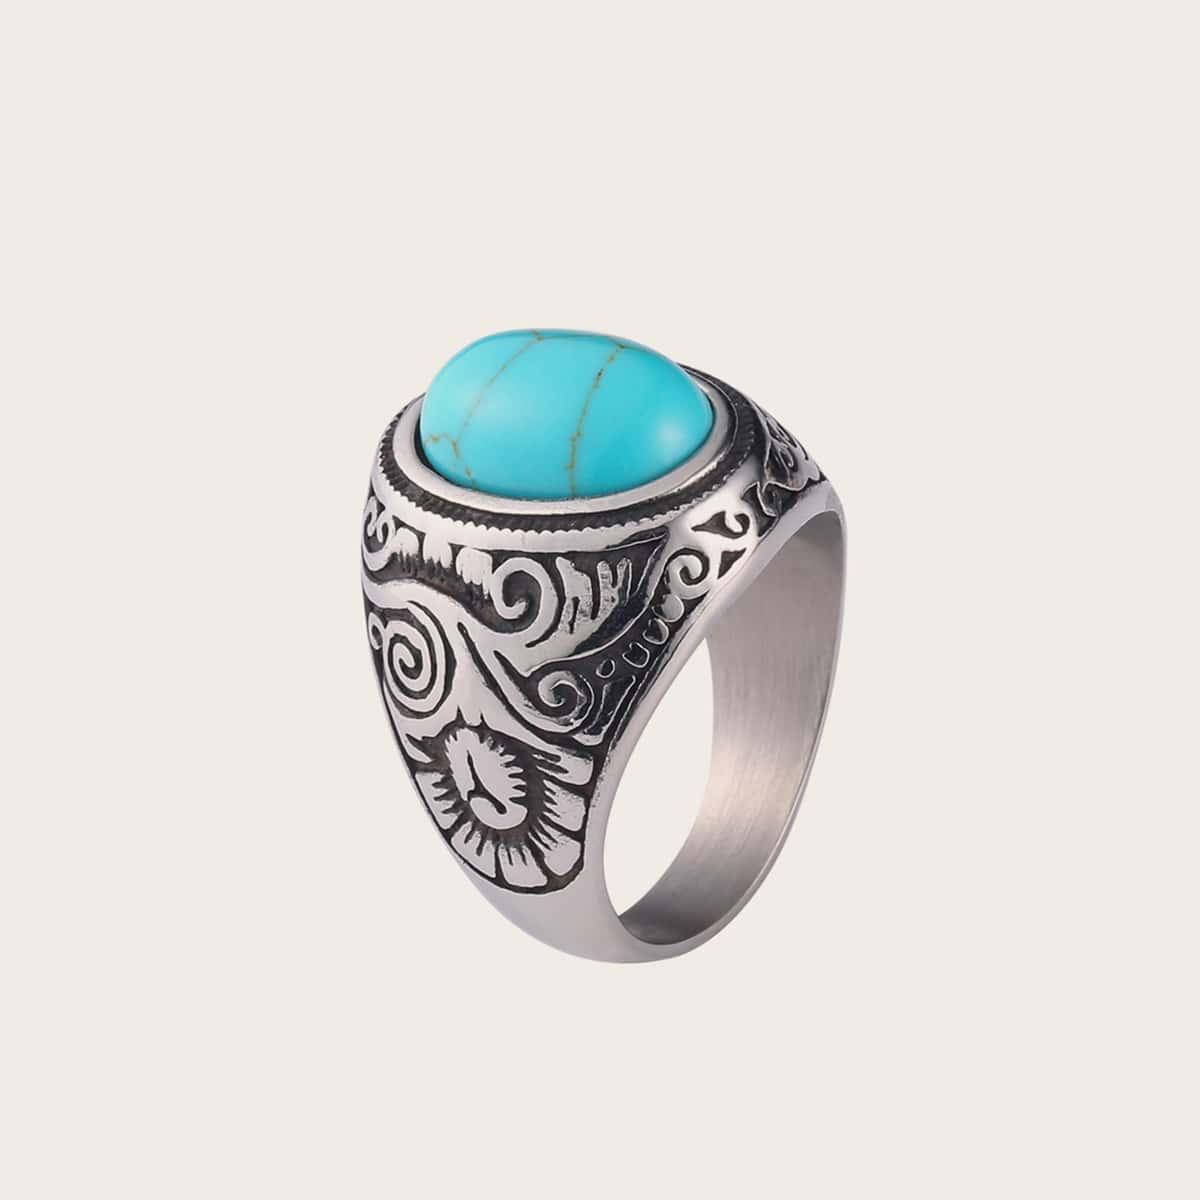 1pc Men Turquoise Decor Ring